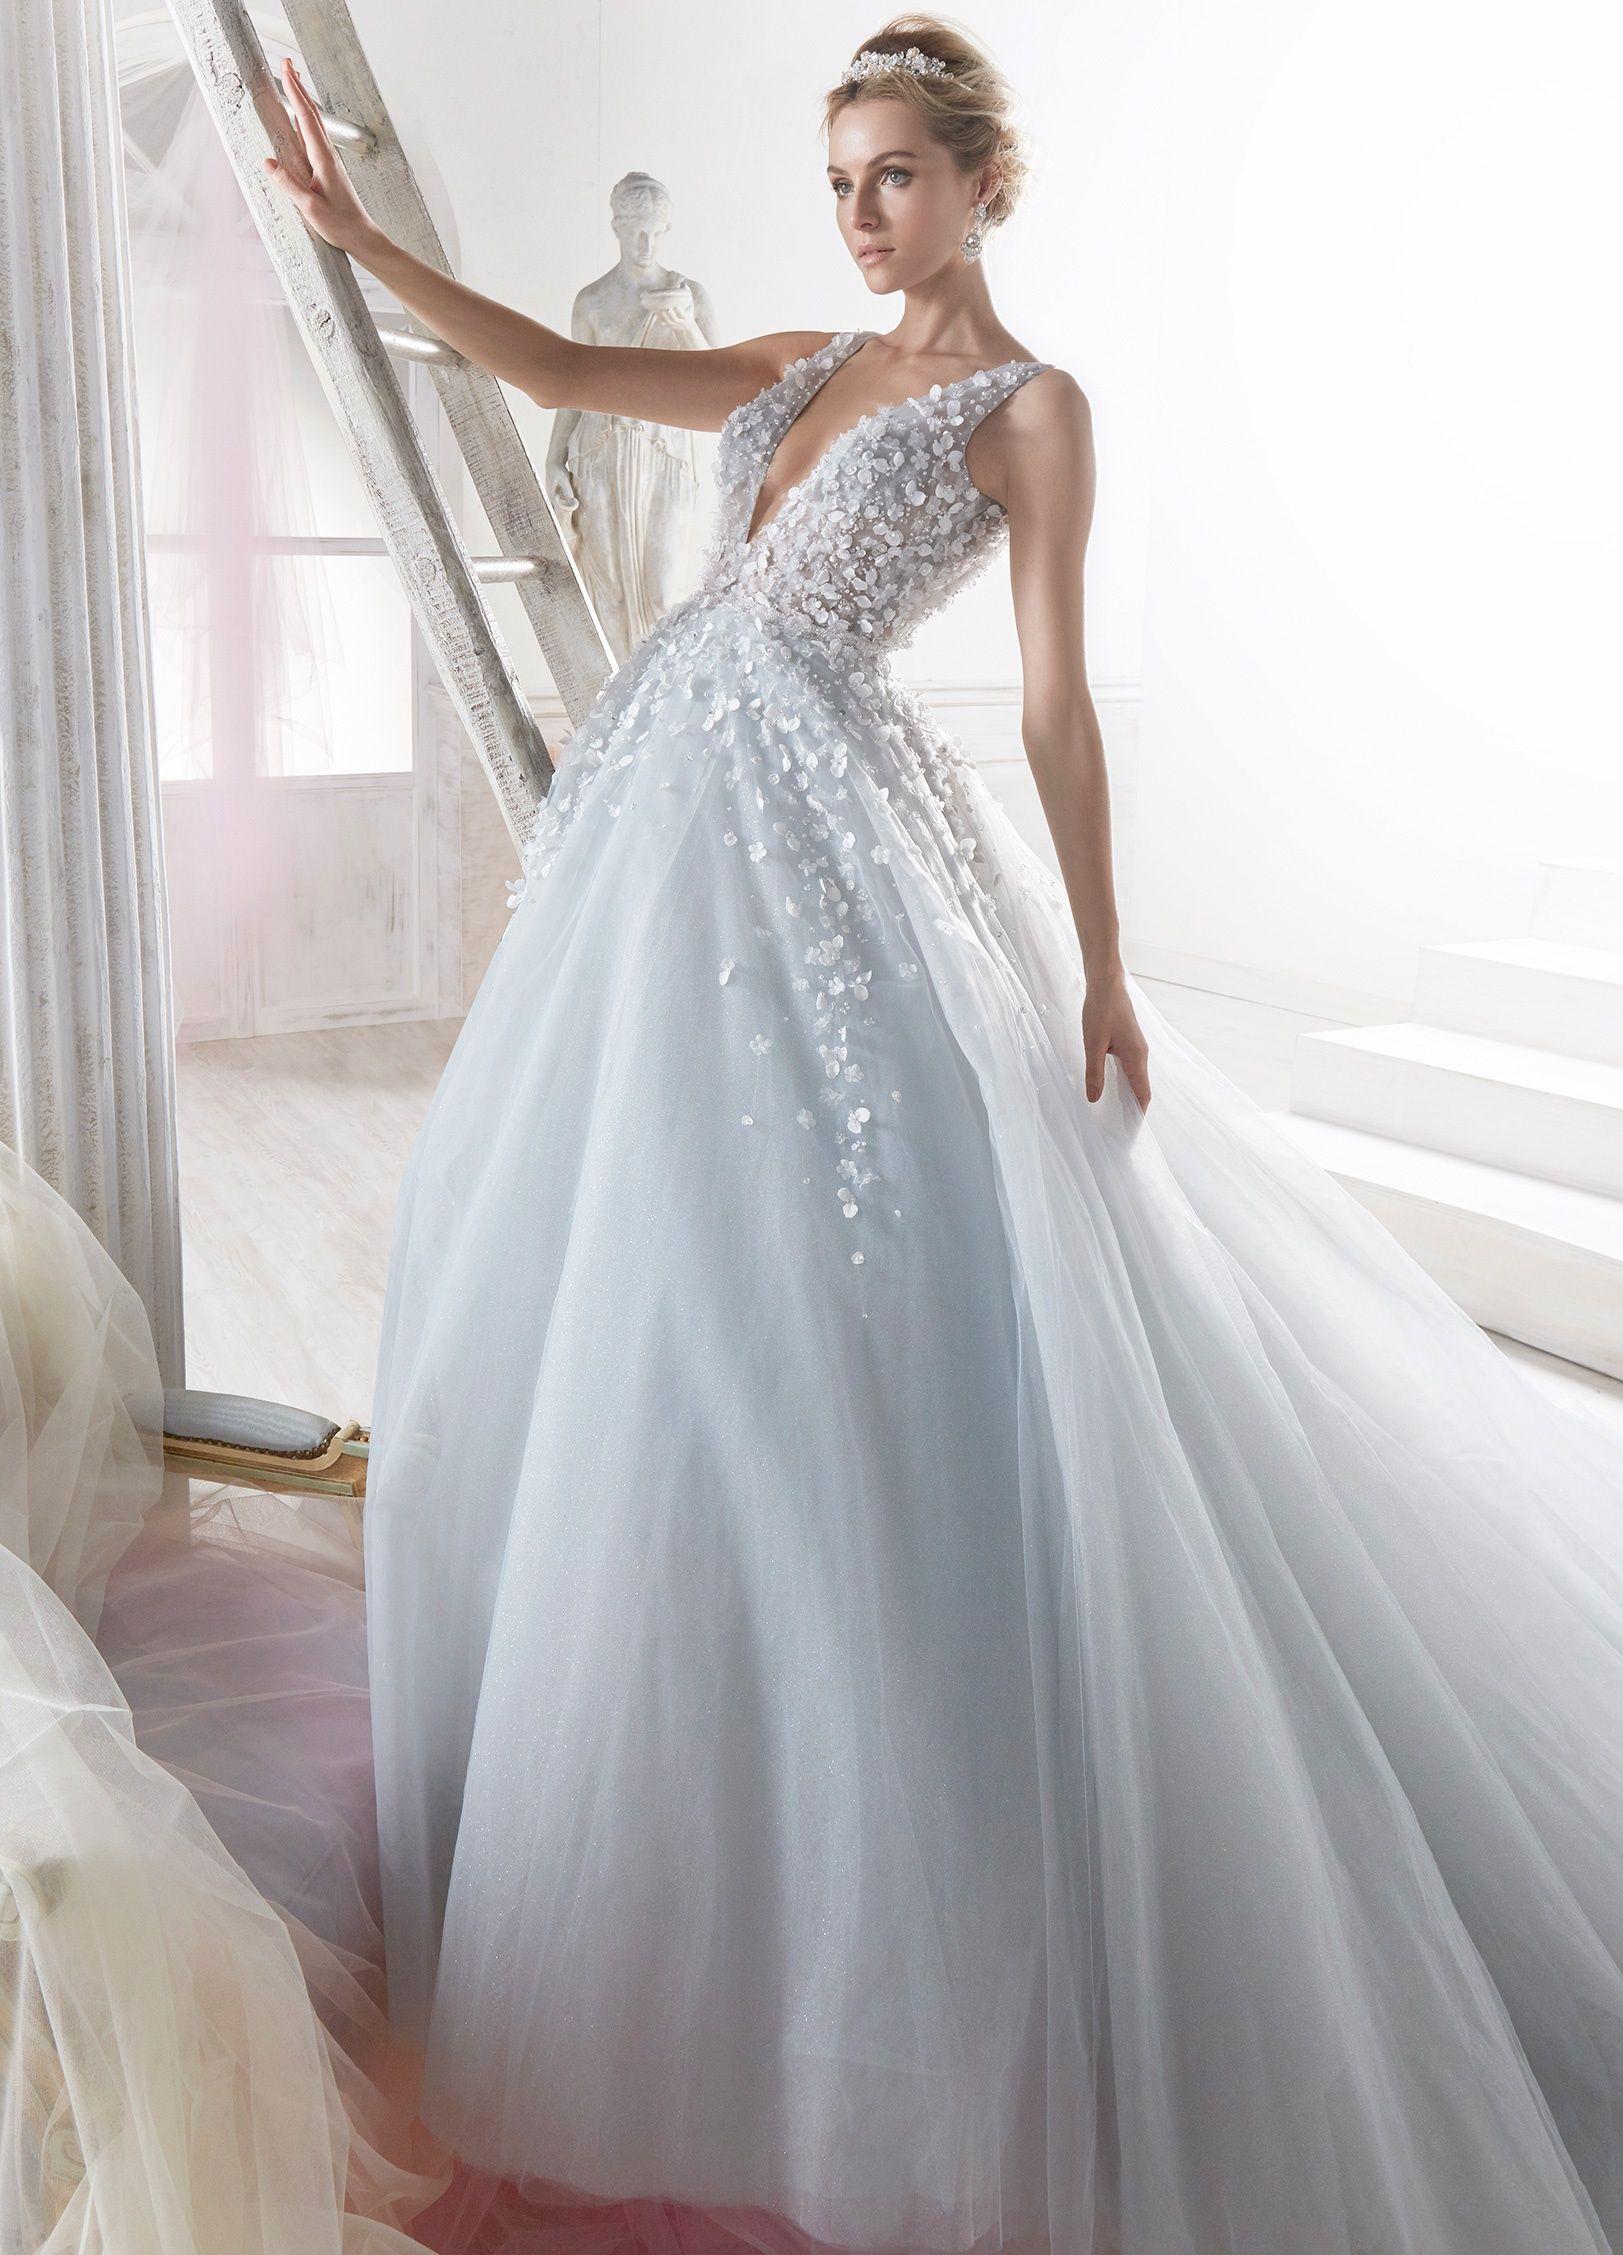 Nicole bridal collection niab wedding dresses